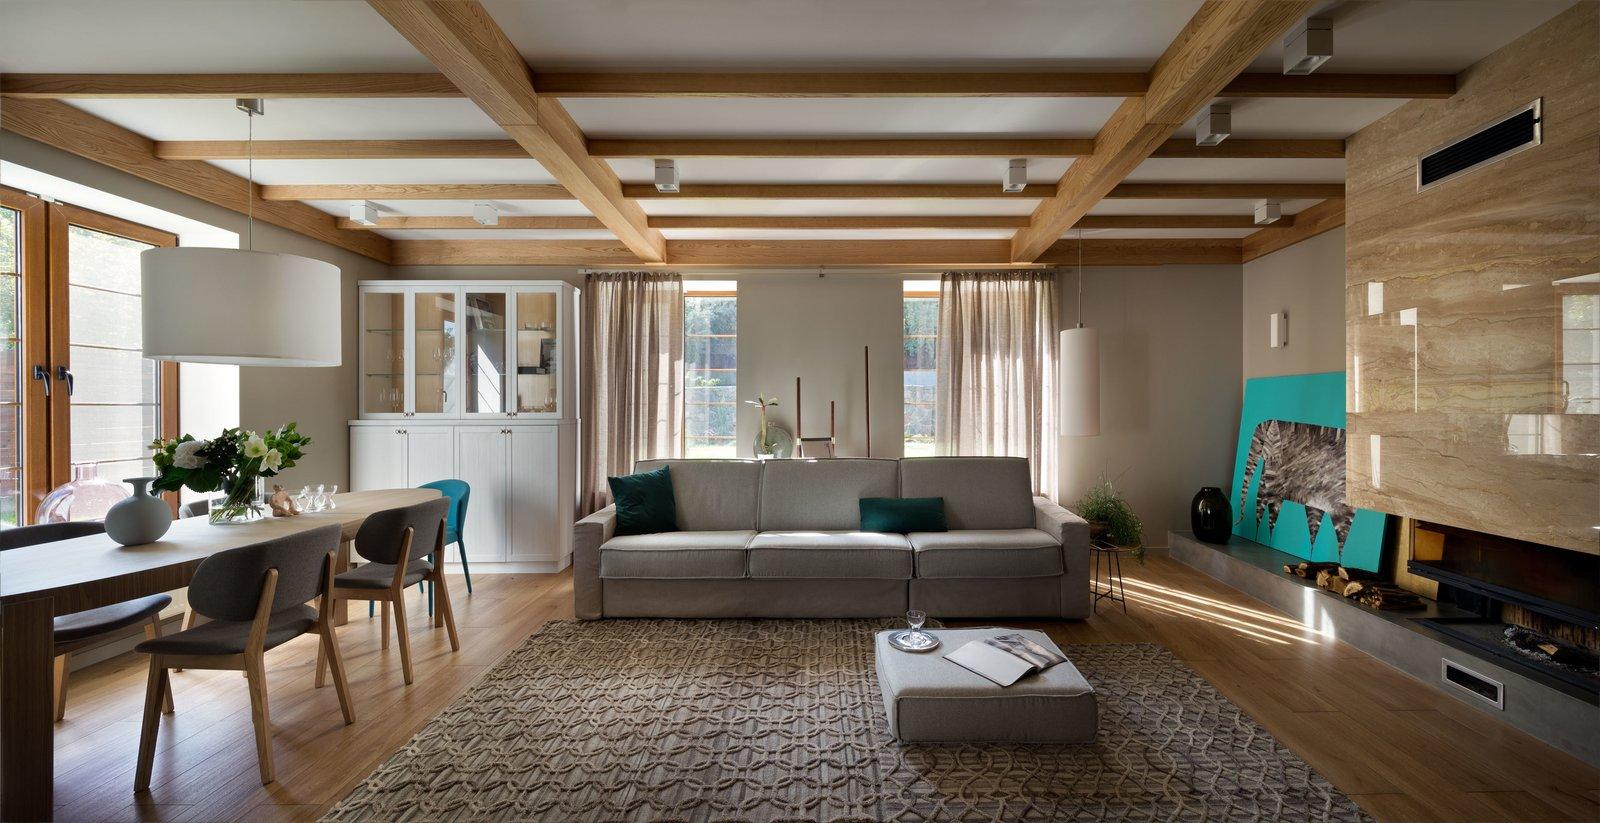 Tagged: Living Room, Sofa, Coffee Tables, Wall Lighting, Pendant Lighting, and Medium Hardwood Floor.  House Lightray by Anna Pahomova